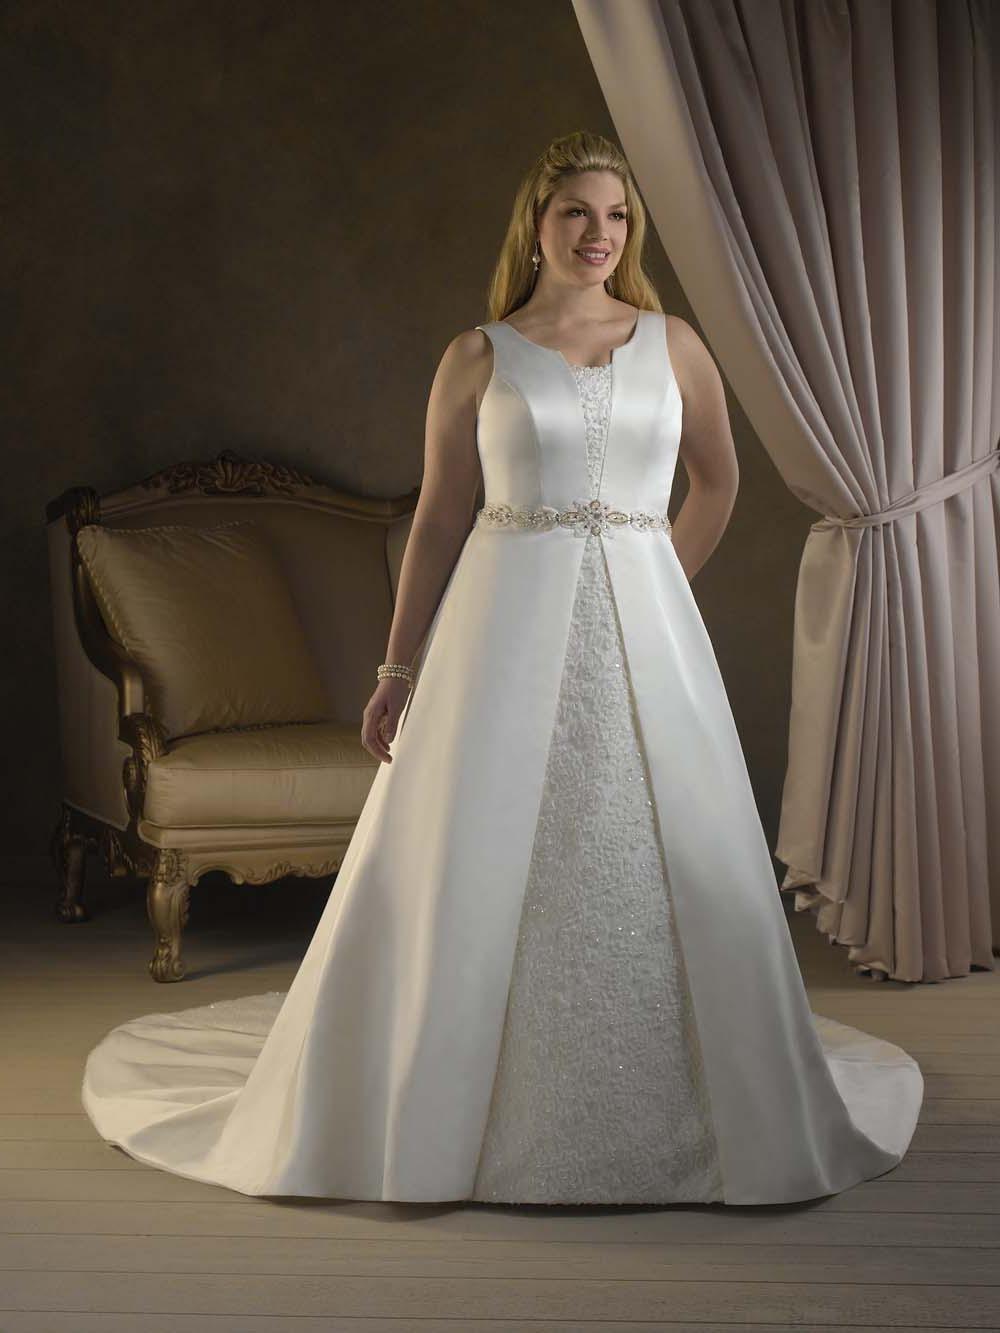 Wedding Dress for Brides